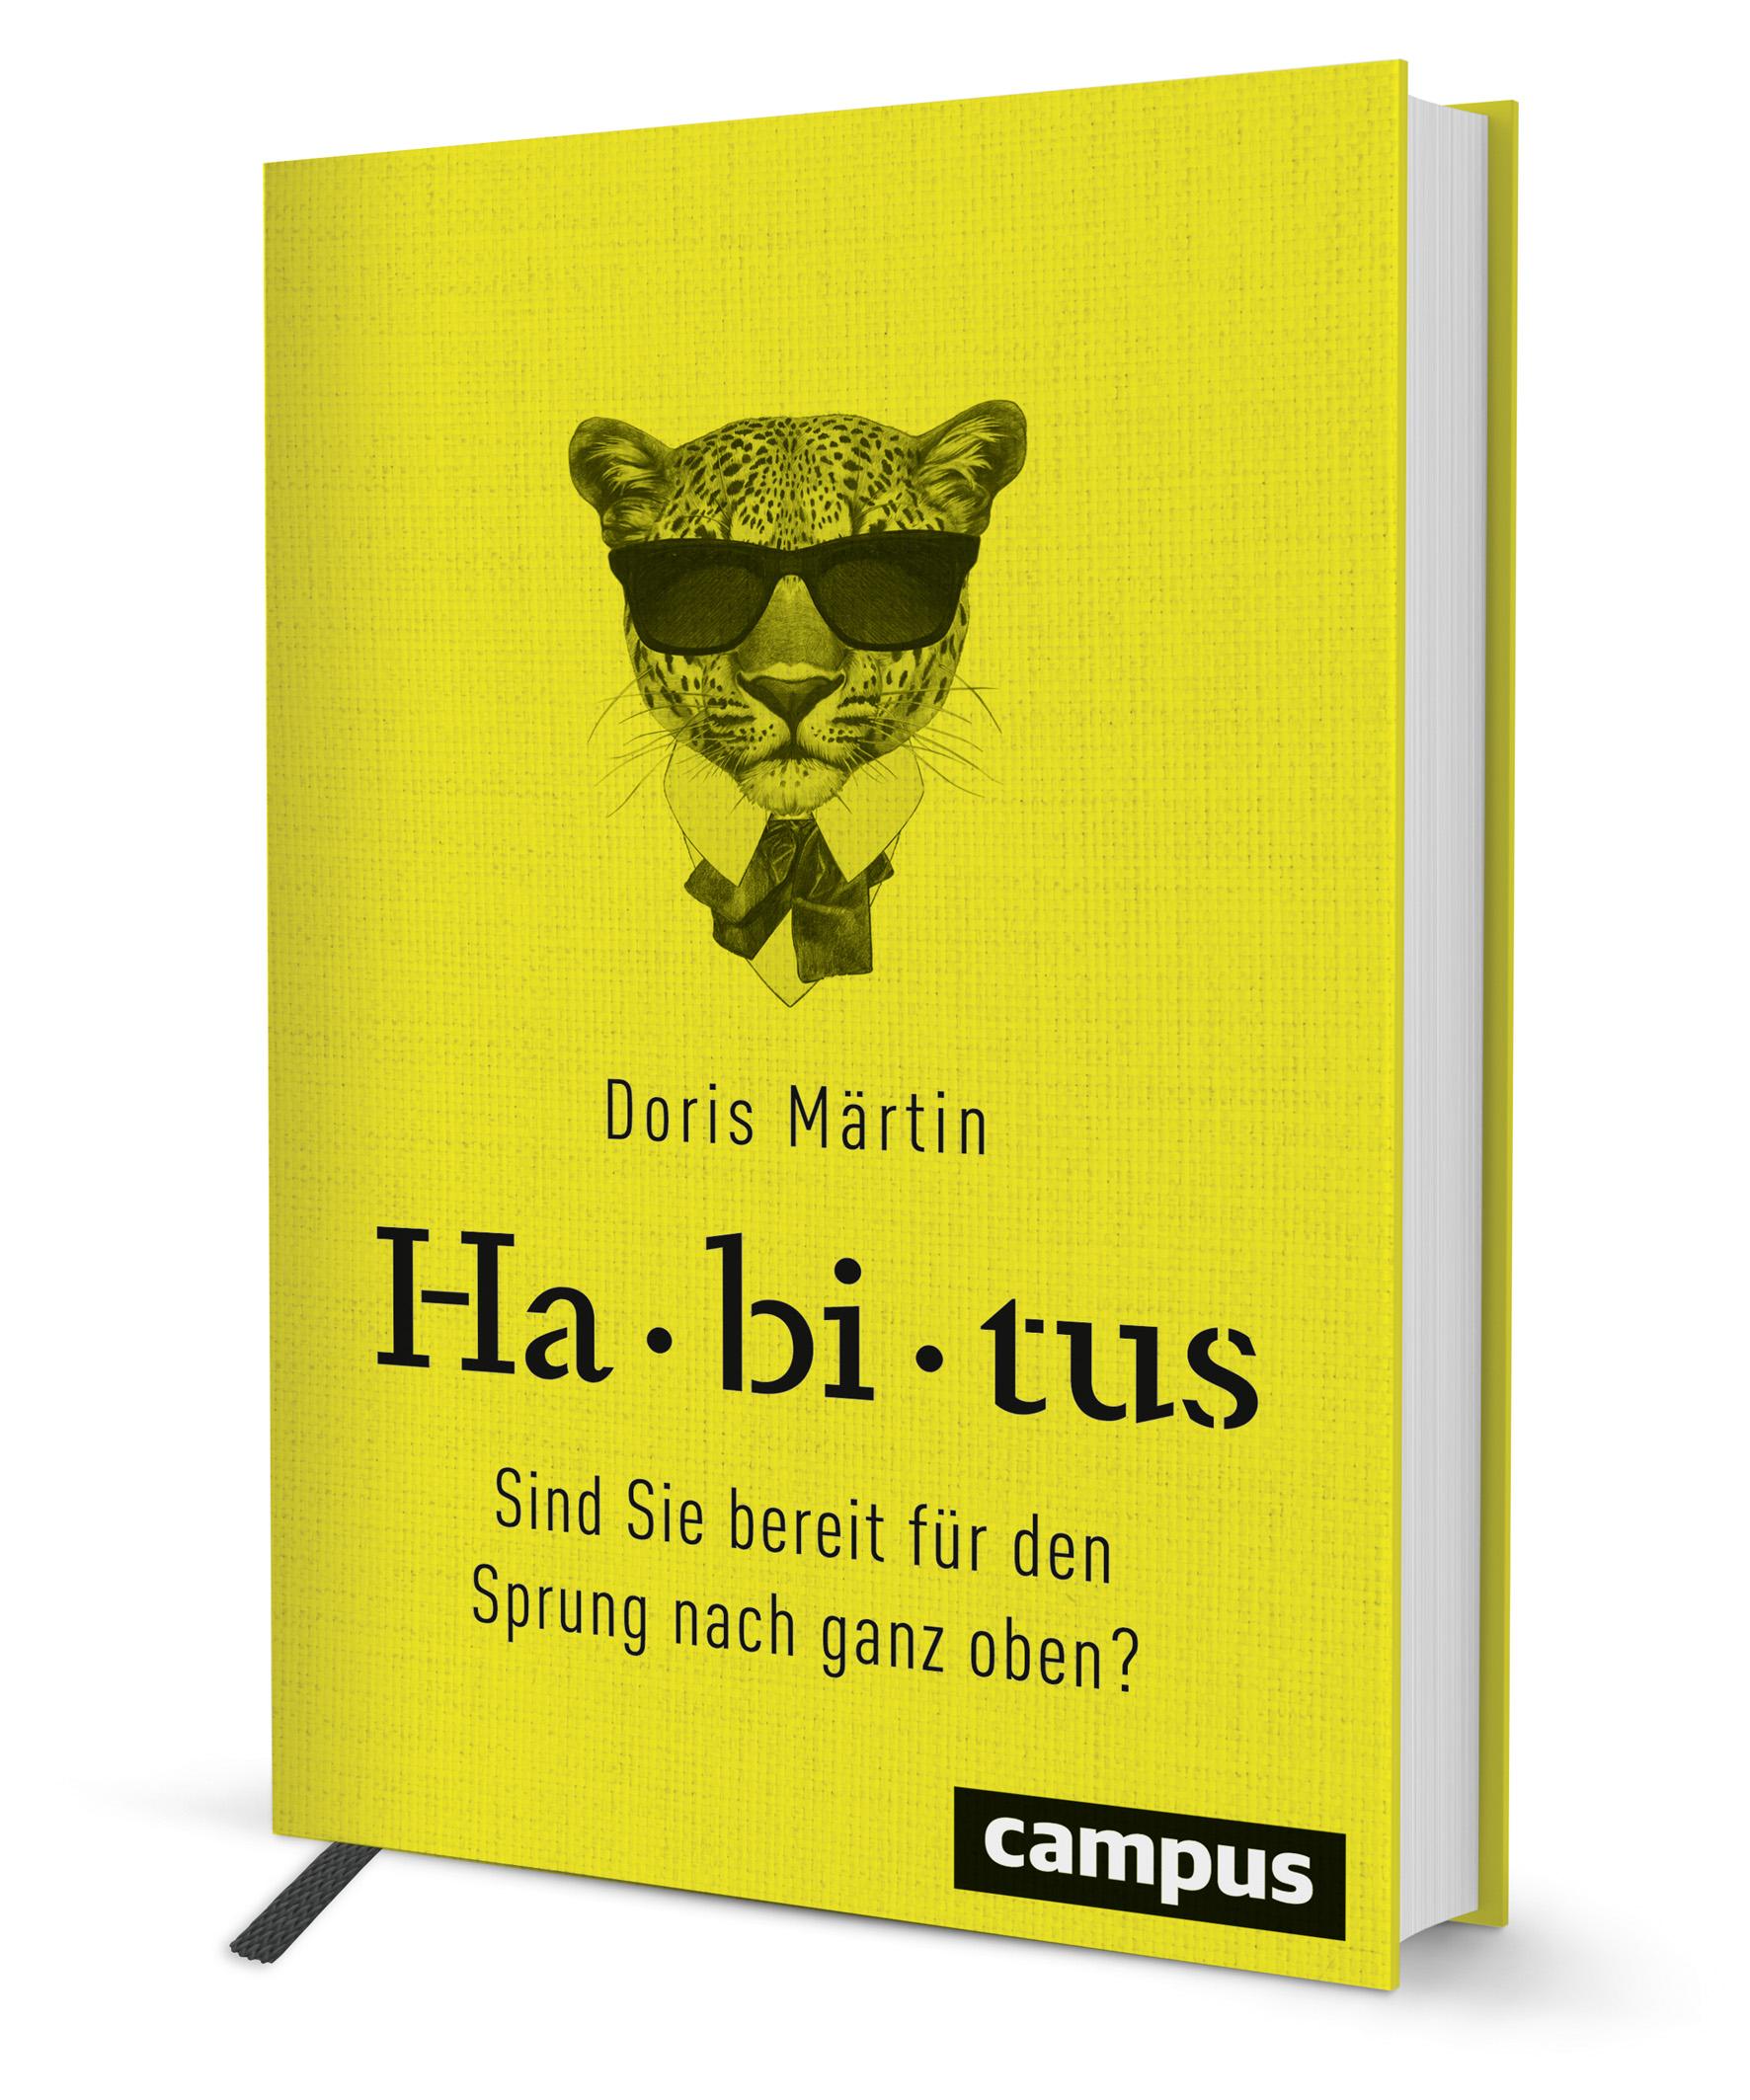 Doris Märtin. Habitus